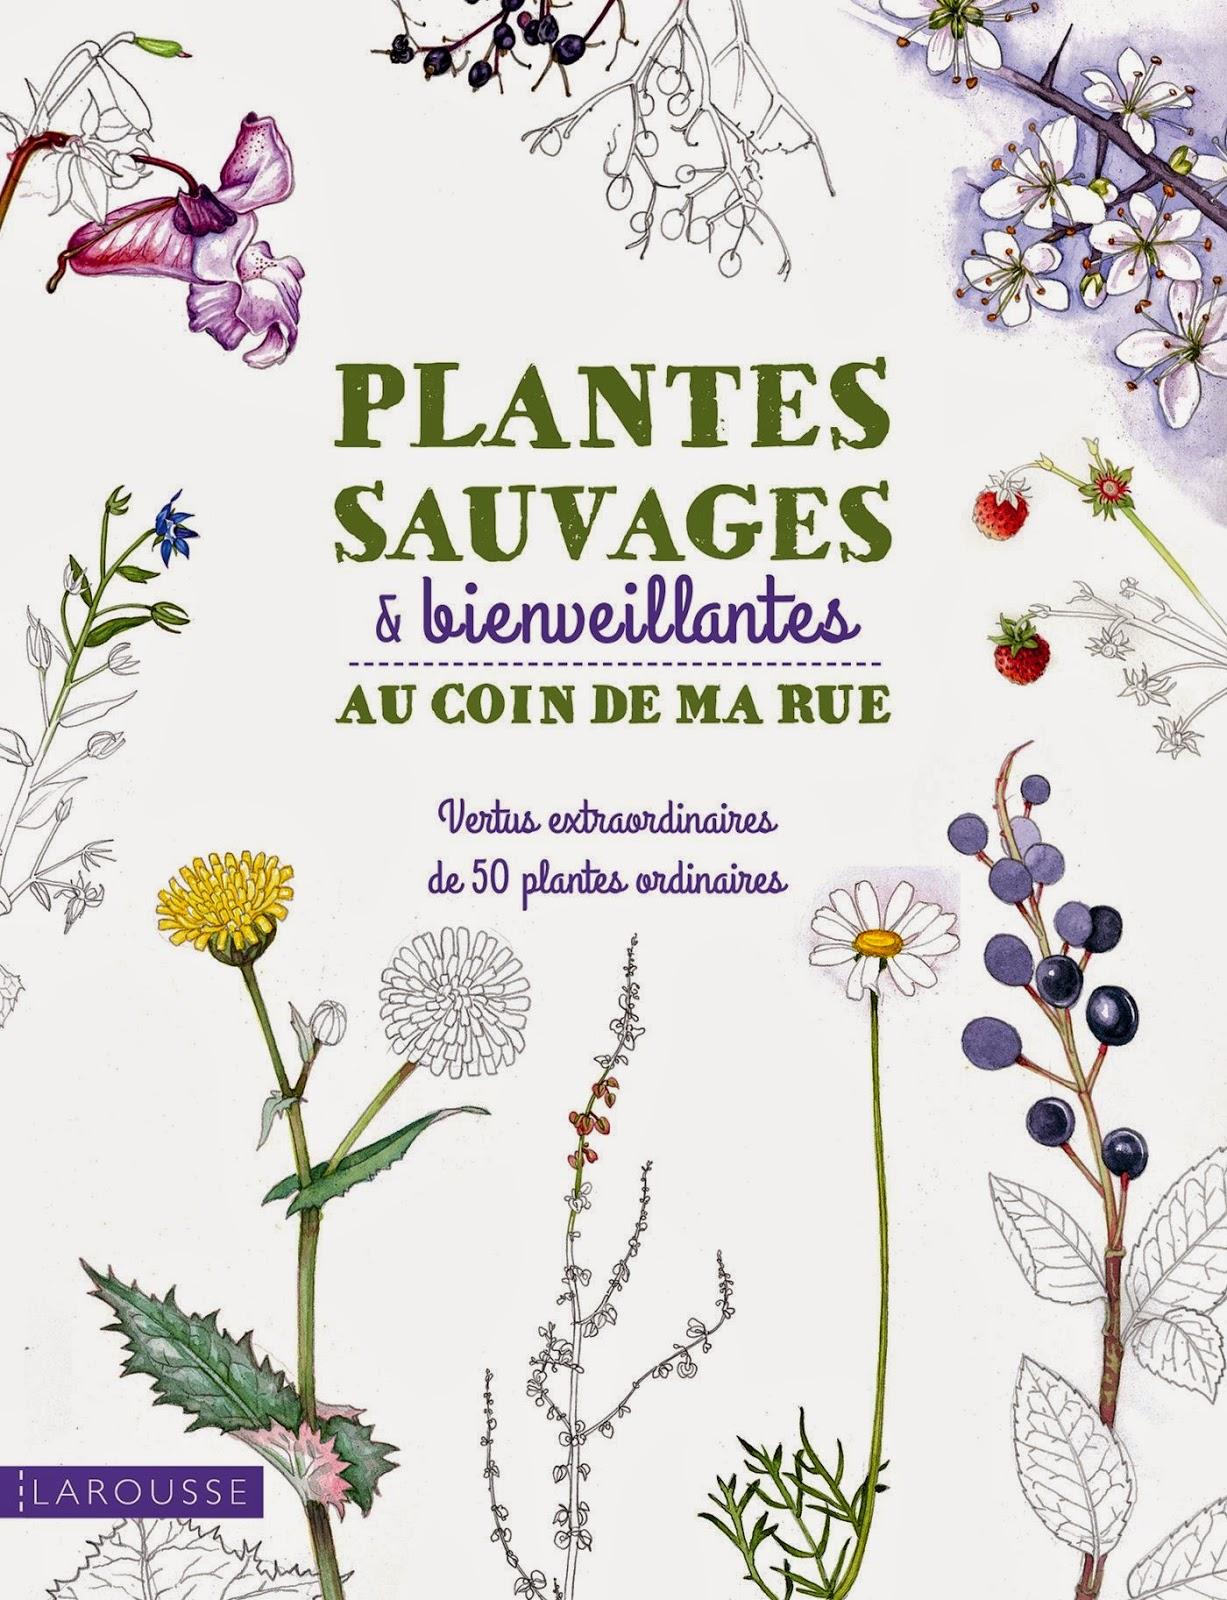 http://www.amazon.fr/Plantes-sauvages-bienveillantes-coin-rue/dp/2035898439/ref=sr_1_4?s=books&ie=UTF8&qid=1422626697&sr=1-4&